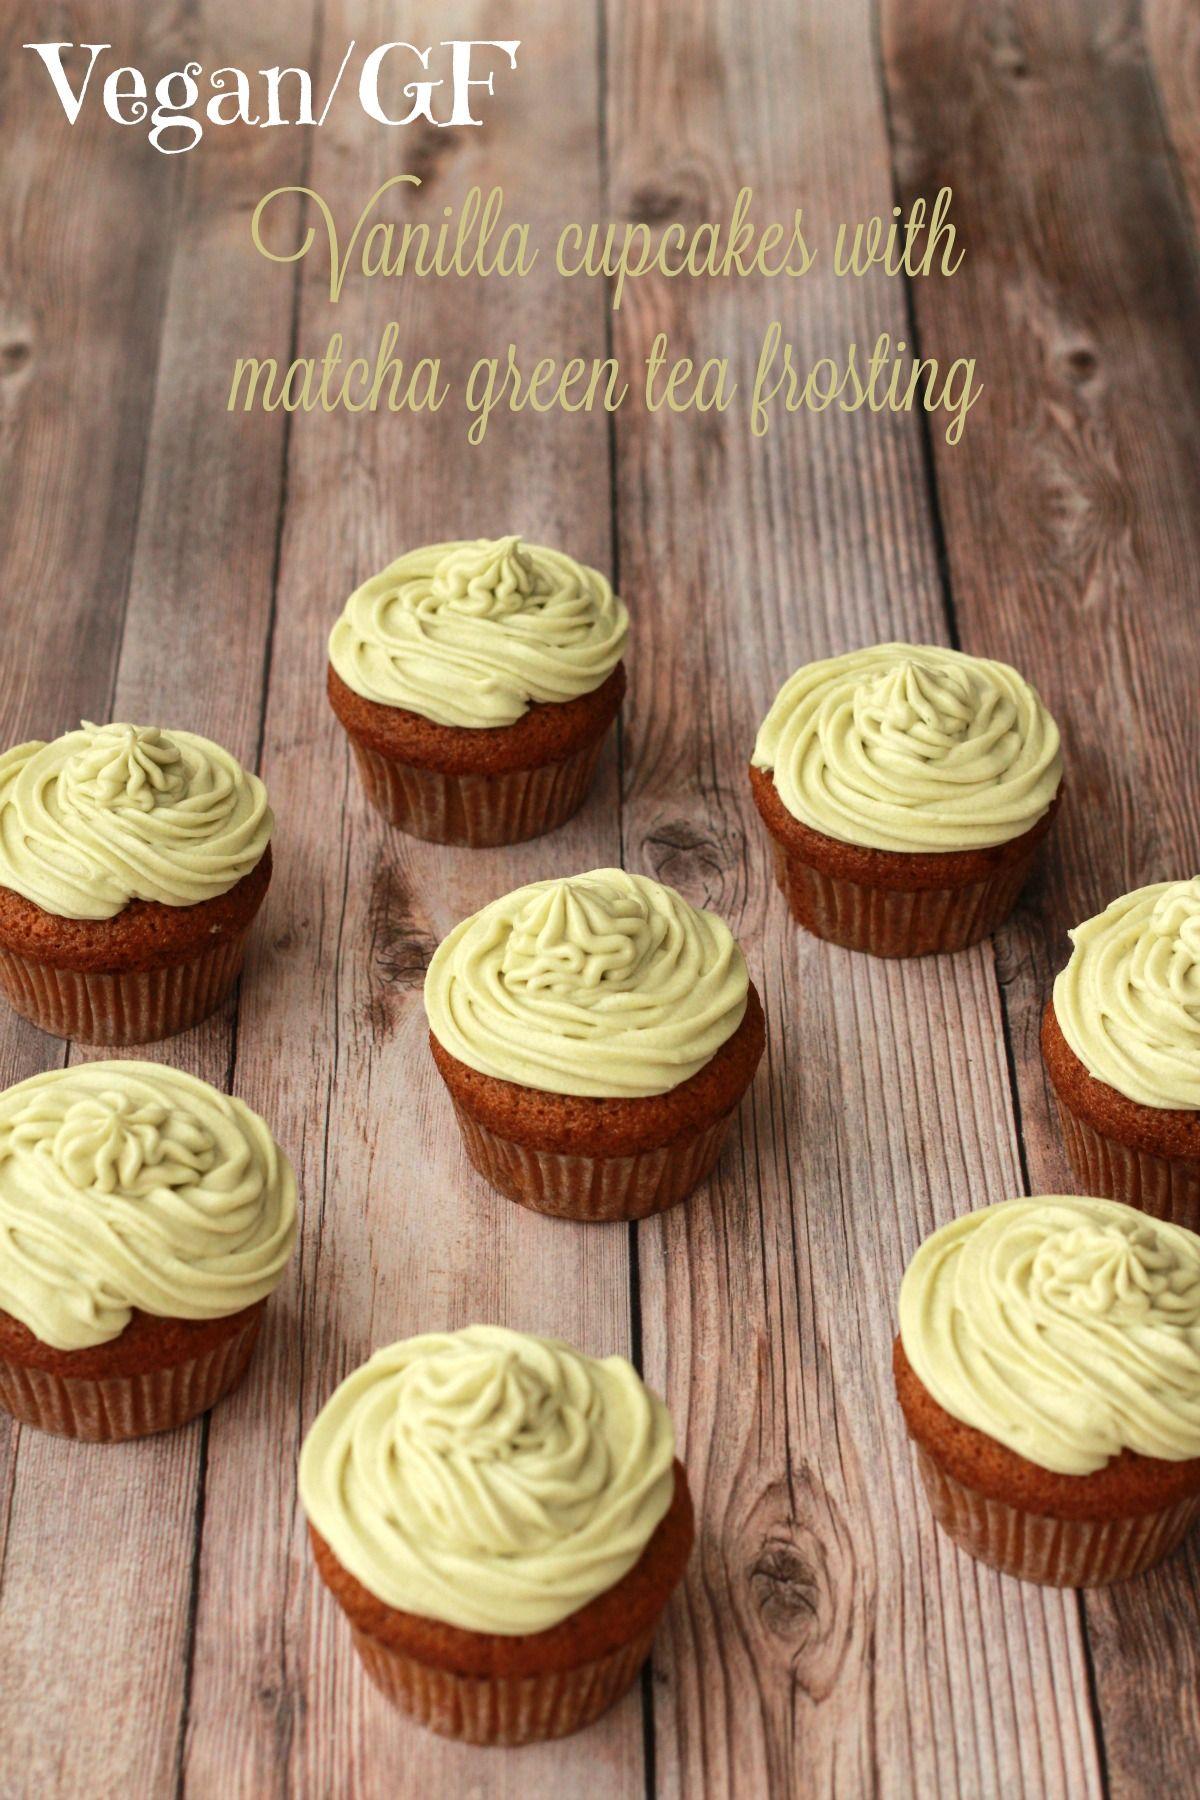 Gluten Free Vegan Vanilla Cupcakes With Matcha Green Tea Frosting Vegan Lovingitvegan Gl Vegan Vanilla Cupcakes Gluten Free Cupcake Recipe Vegan Gluten Free